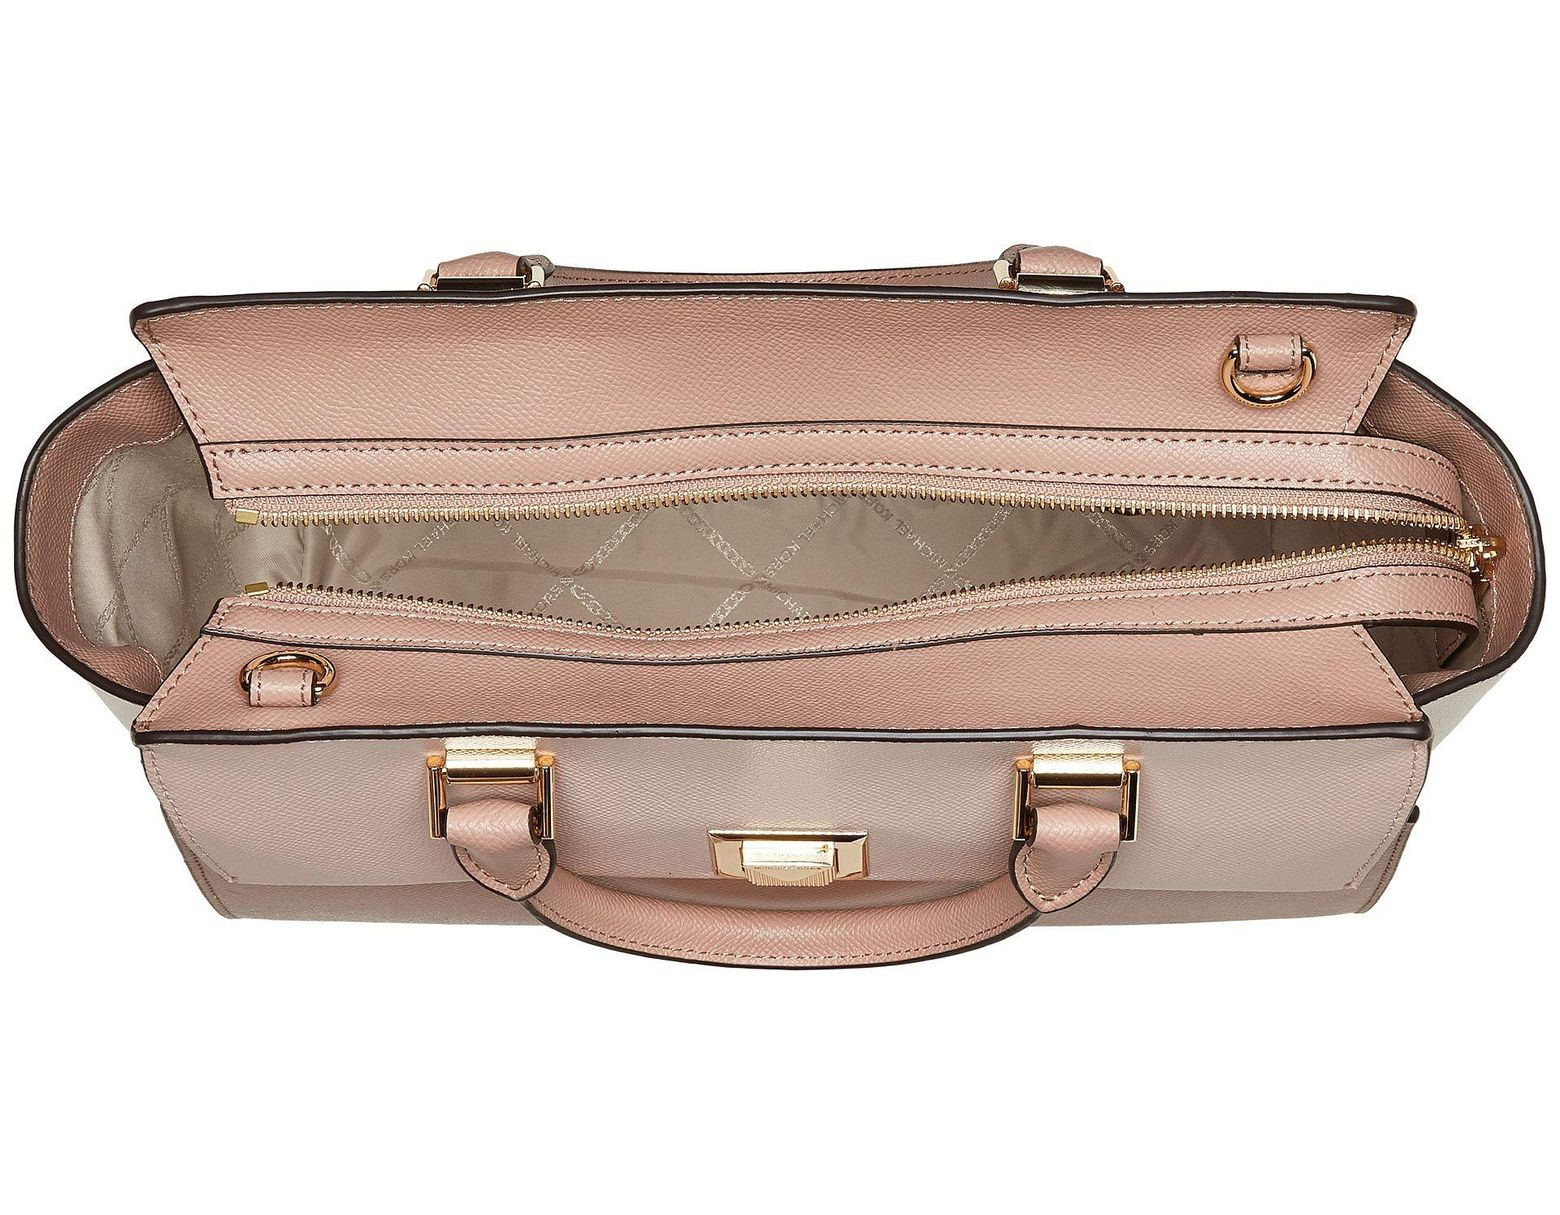 8efb99c6322c MICHAEL Michael Kors Sylvia Medium Top Zip Satchel (soft Pink/light Cream/fawn)  Satchel Handbags in Pink - Save 66% - Lyst